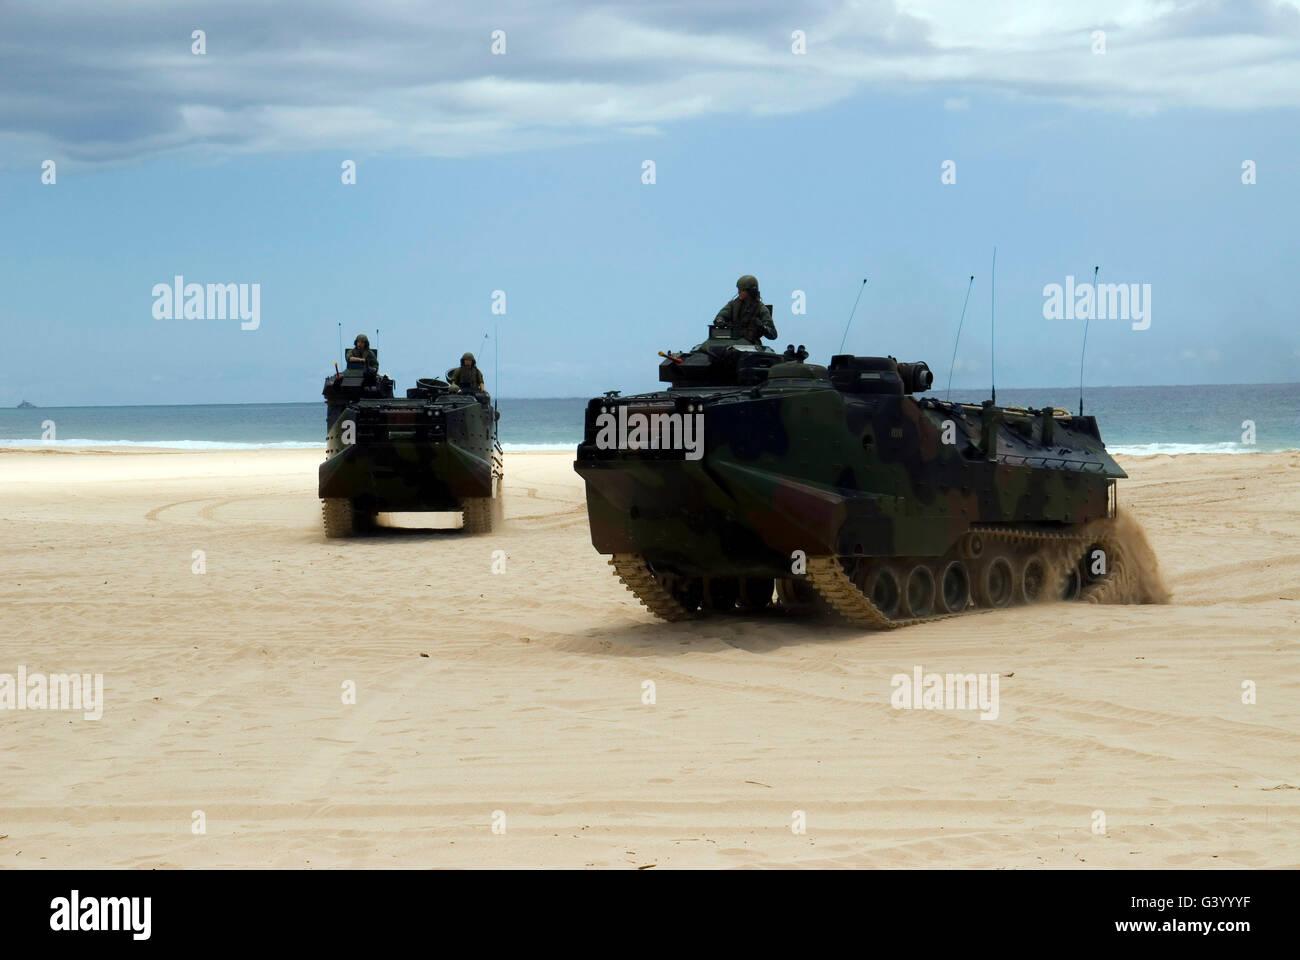 Armored assault vehicles performing maneuvers at Pacific Missile Range Facility at Barking Sands, Hawaii. Stock Photo